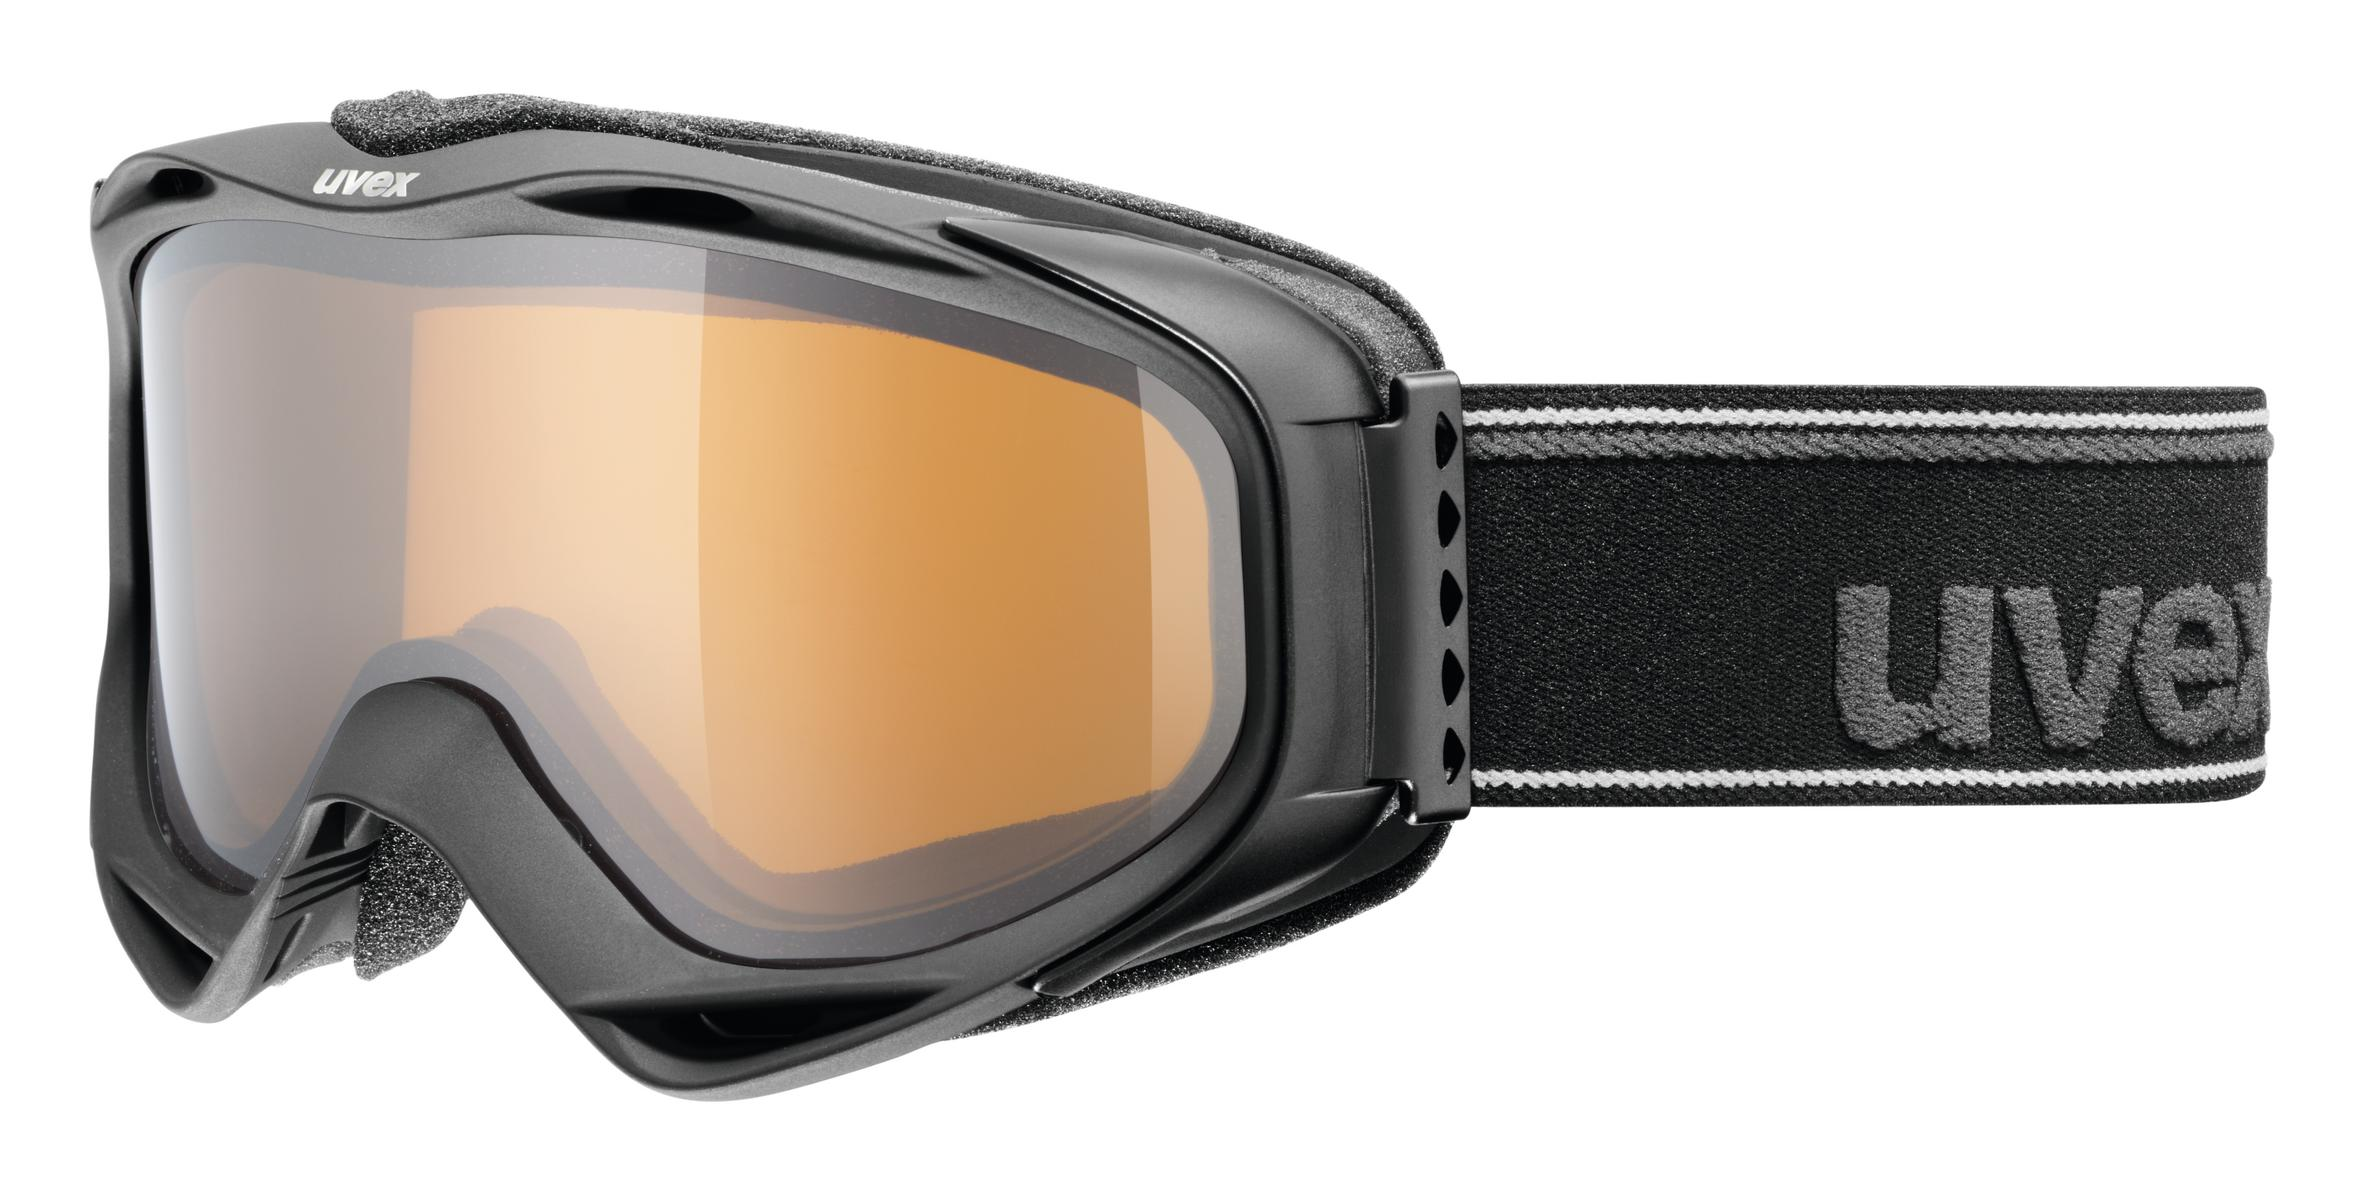 uvex-g-gl-300-polavision-brillentr-auml-gerskibrille-farbe-2221-black-mat-polavision-brown-clear-, 49.90 EUR @ sportolino-de